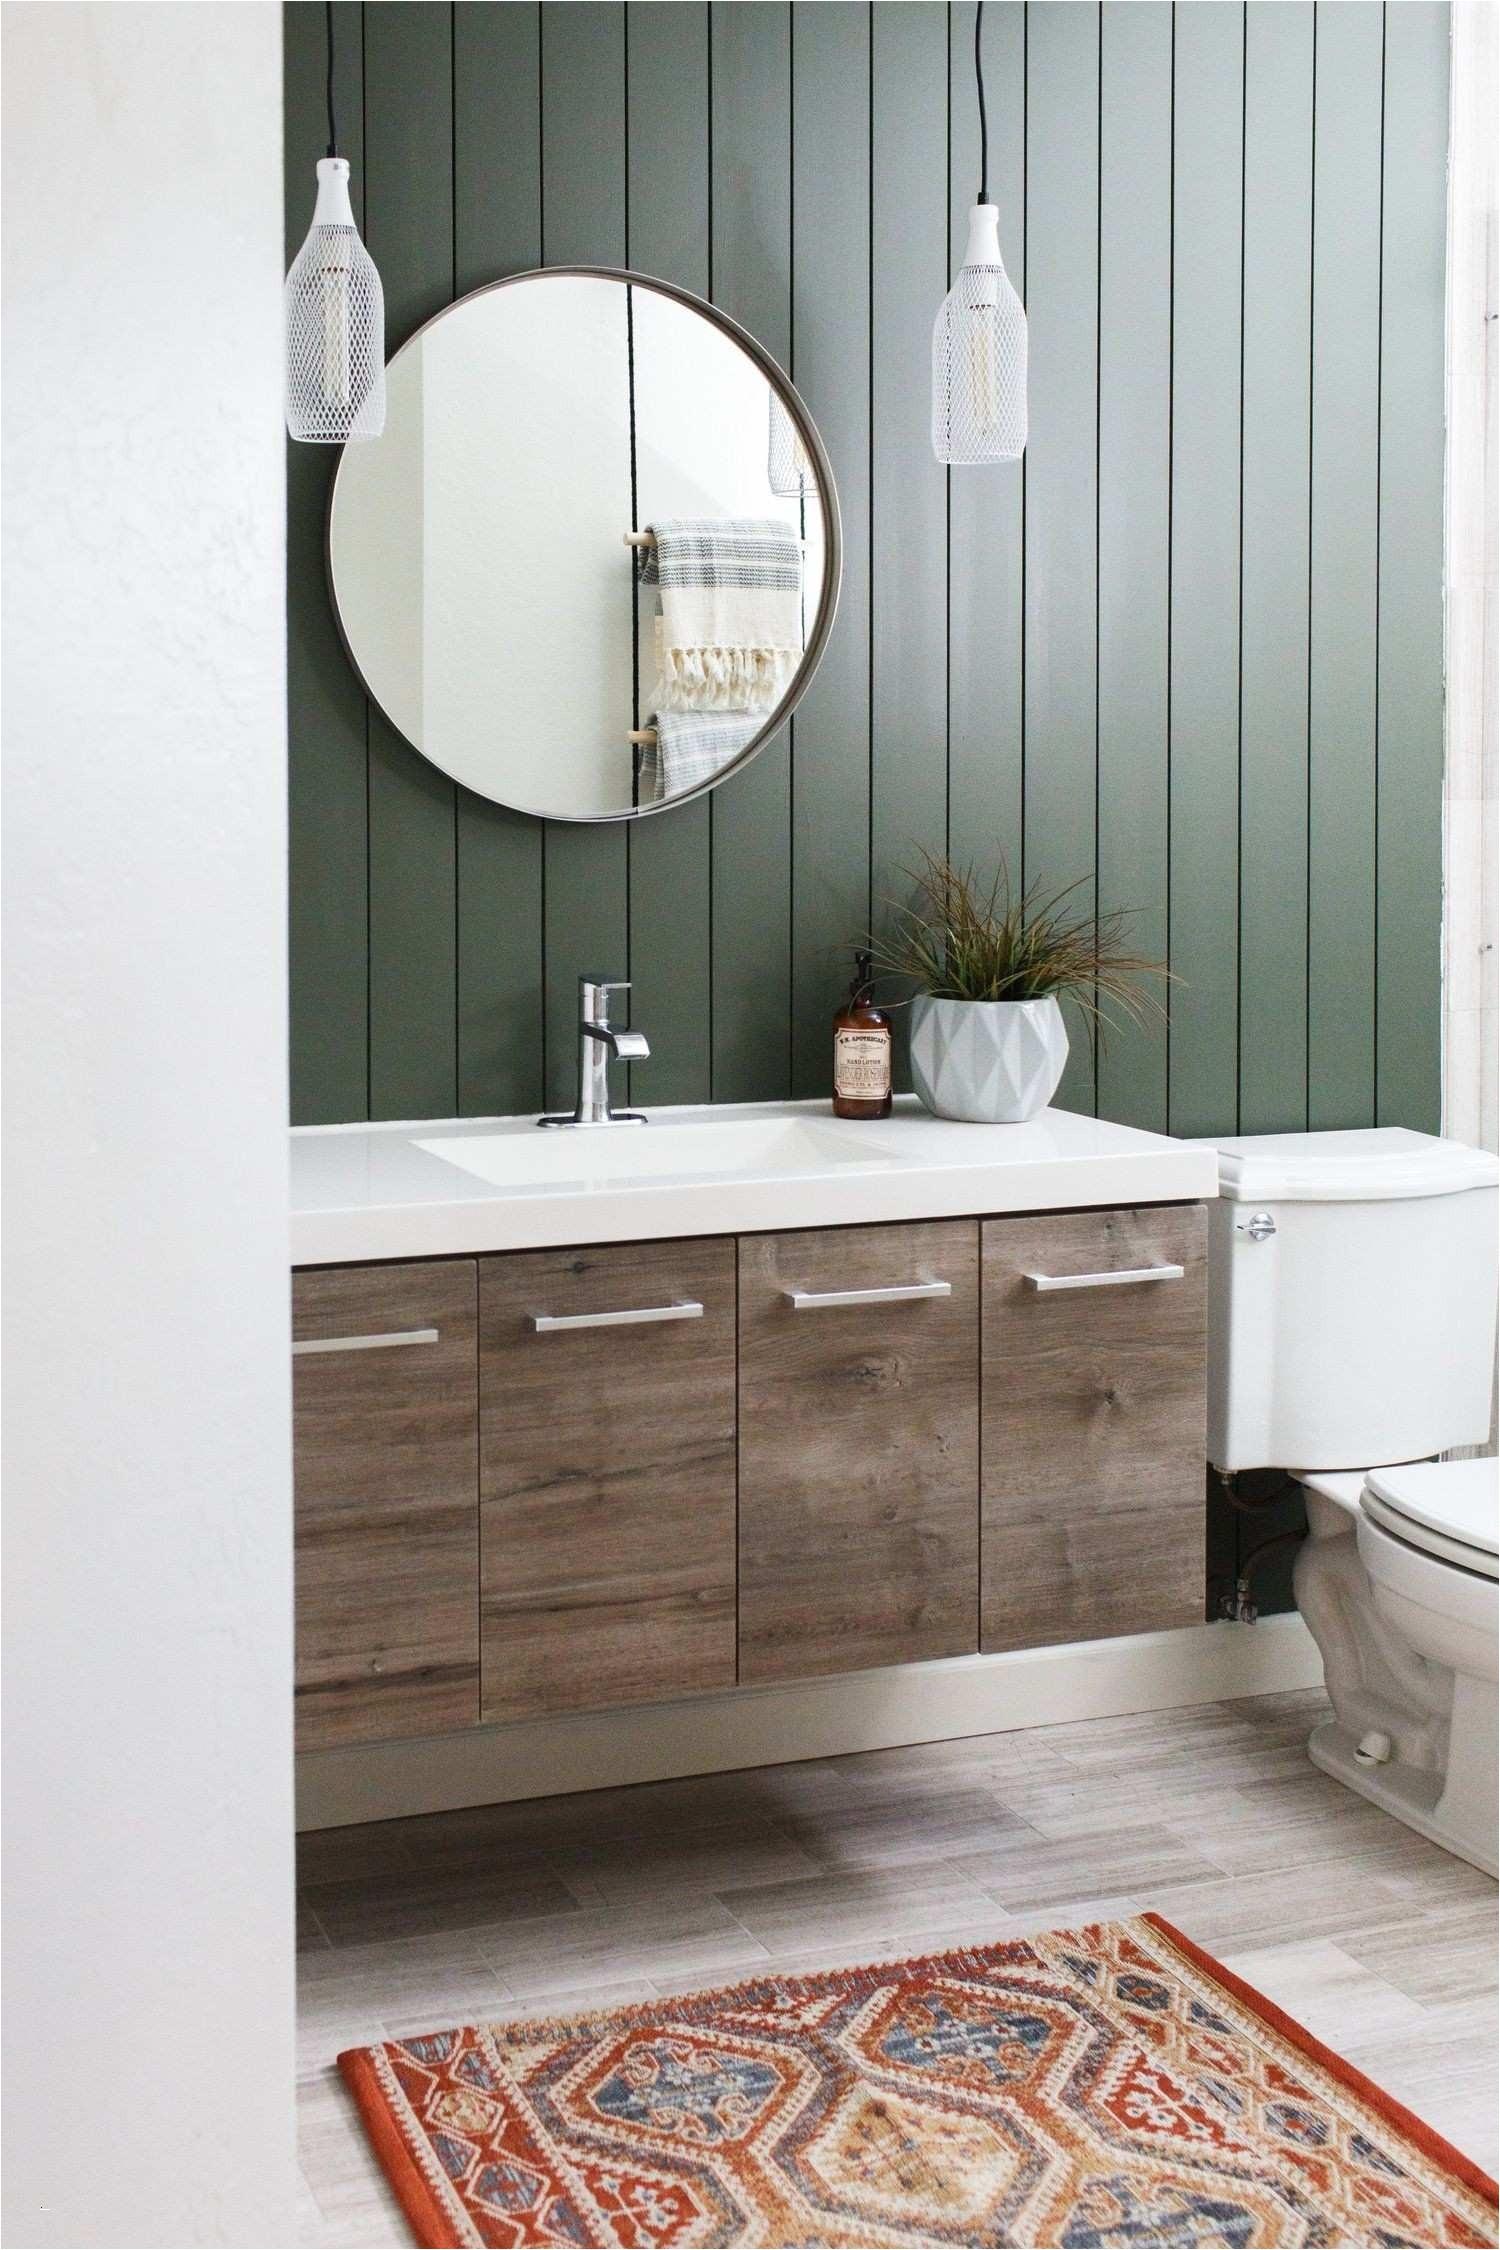 vanity light mirror lovely light over mirror in bathroom luxury 24 best best bathroom light